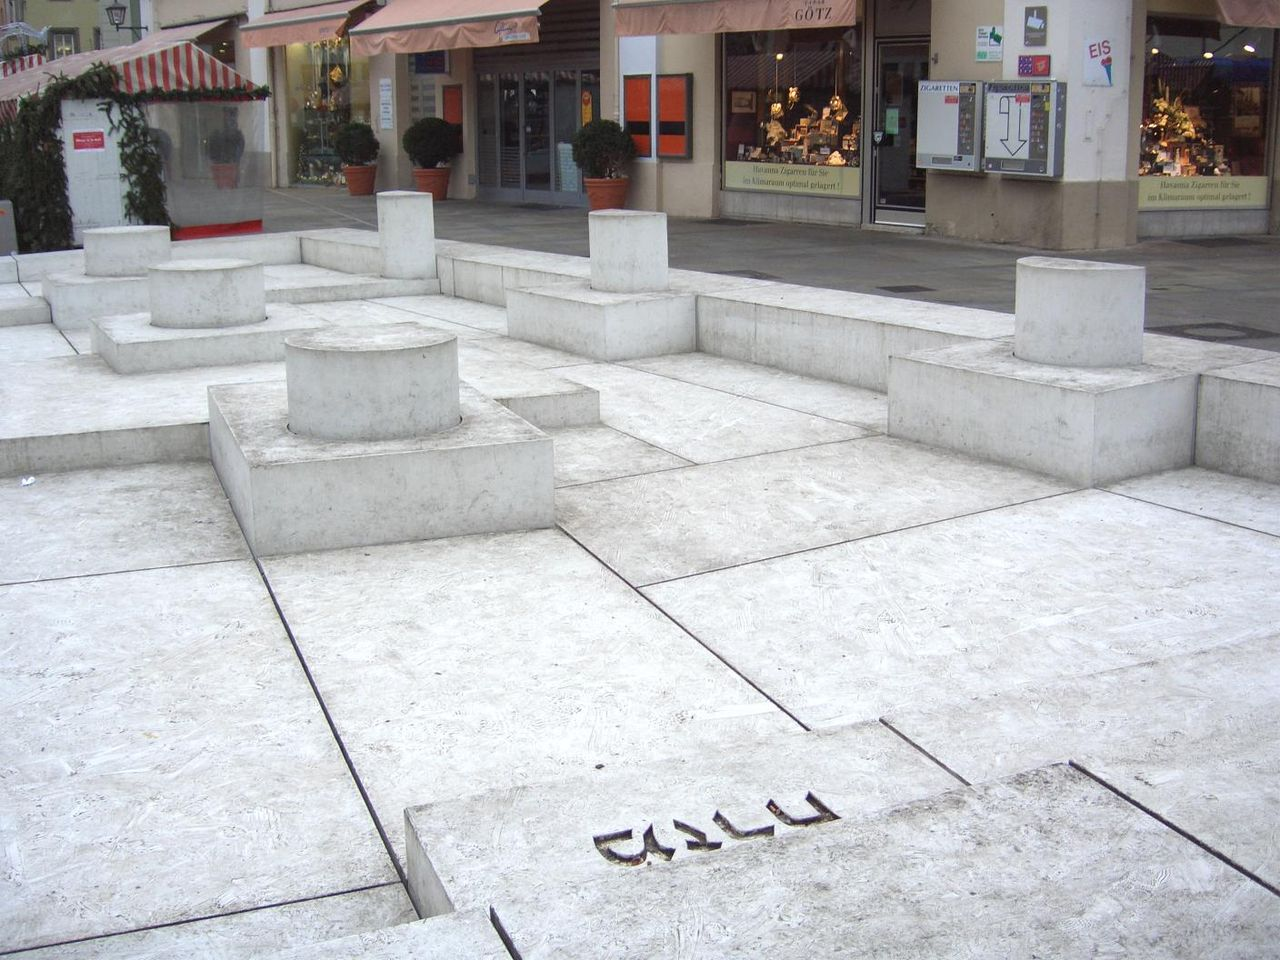 Bild Document Neupfarrplatz Regensburg